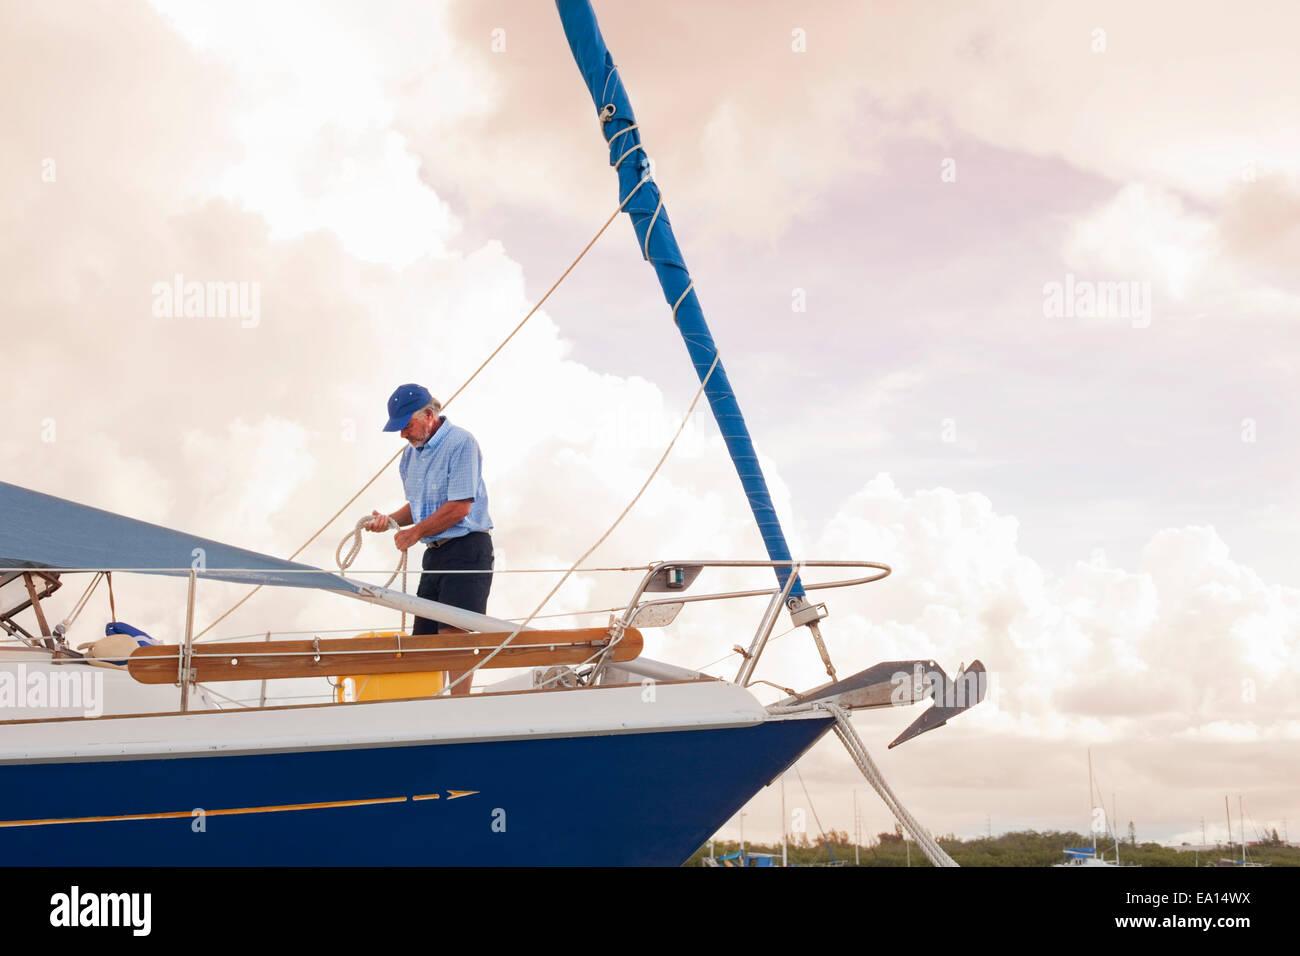 Senior woman Prüfung Seile auf Segelboot Stockbild